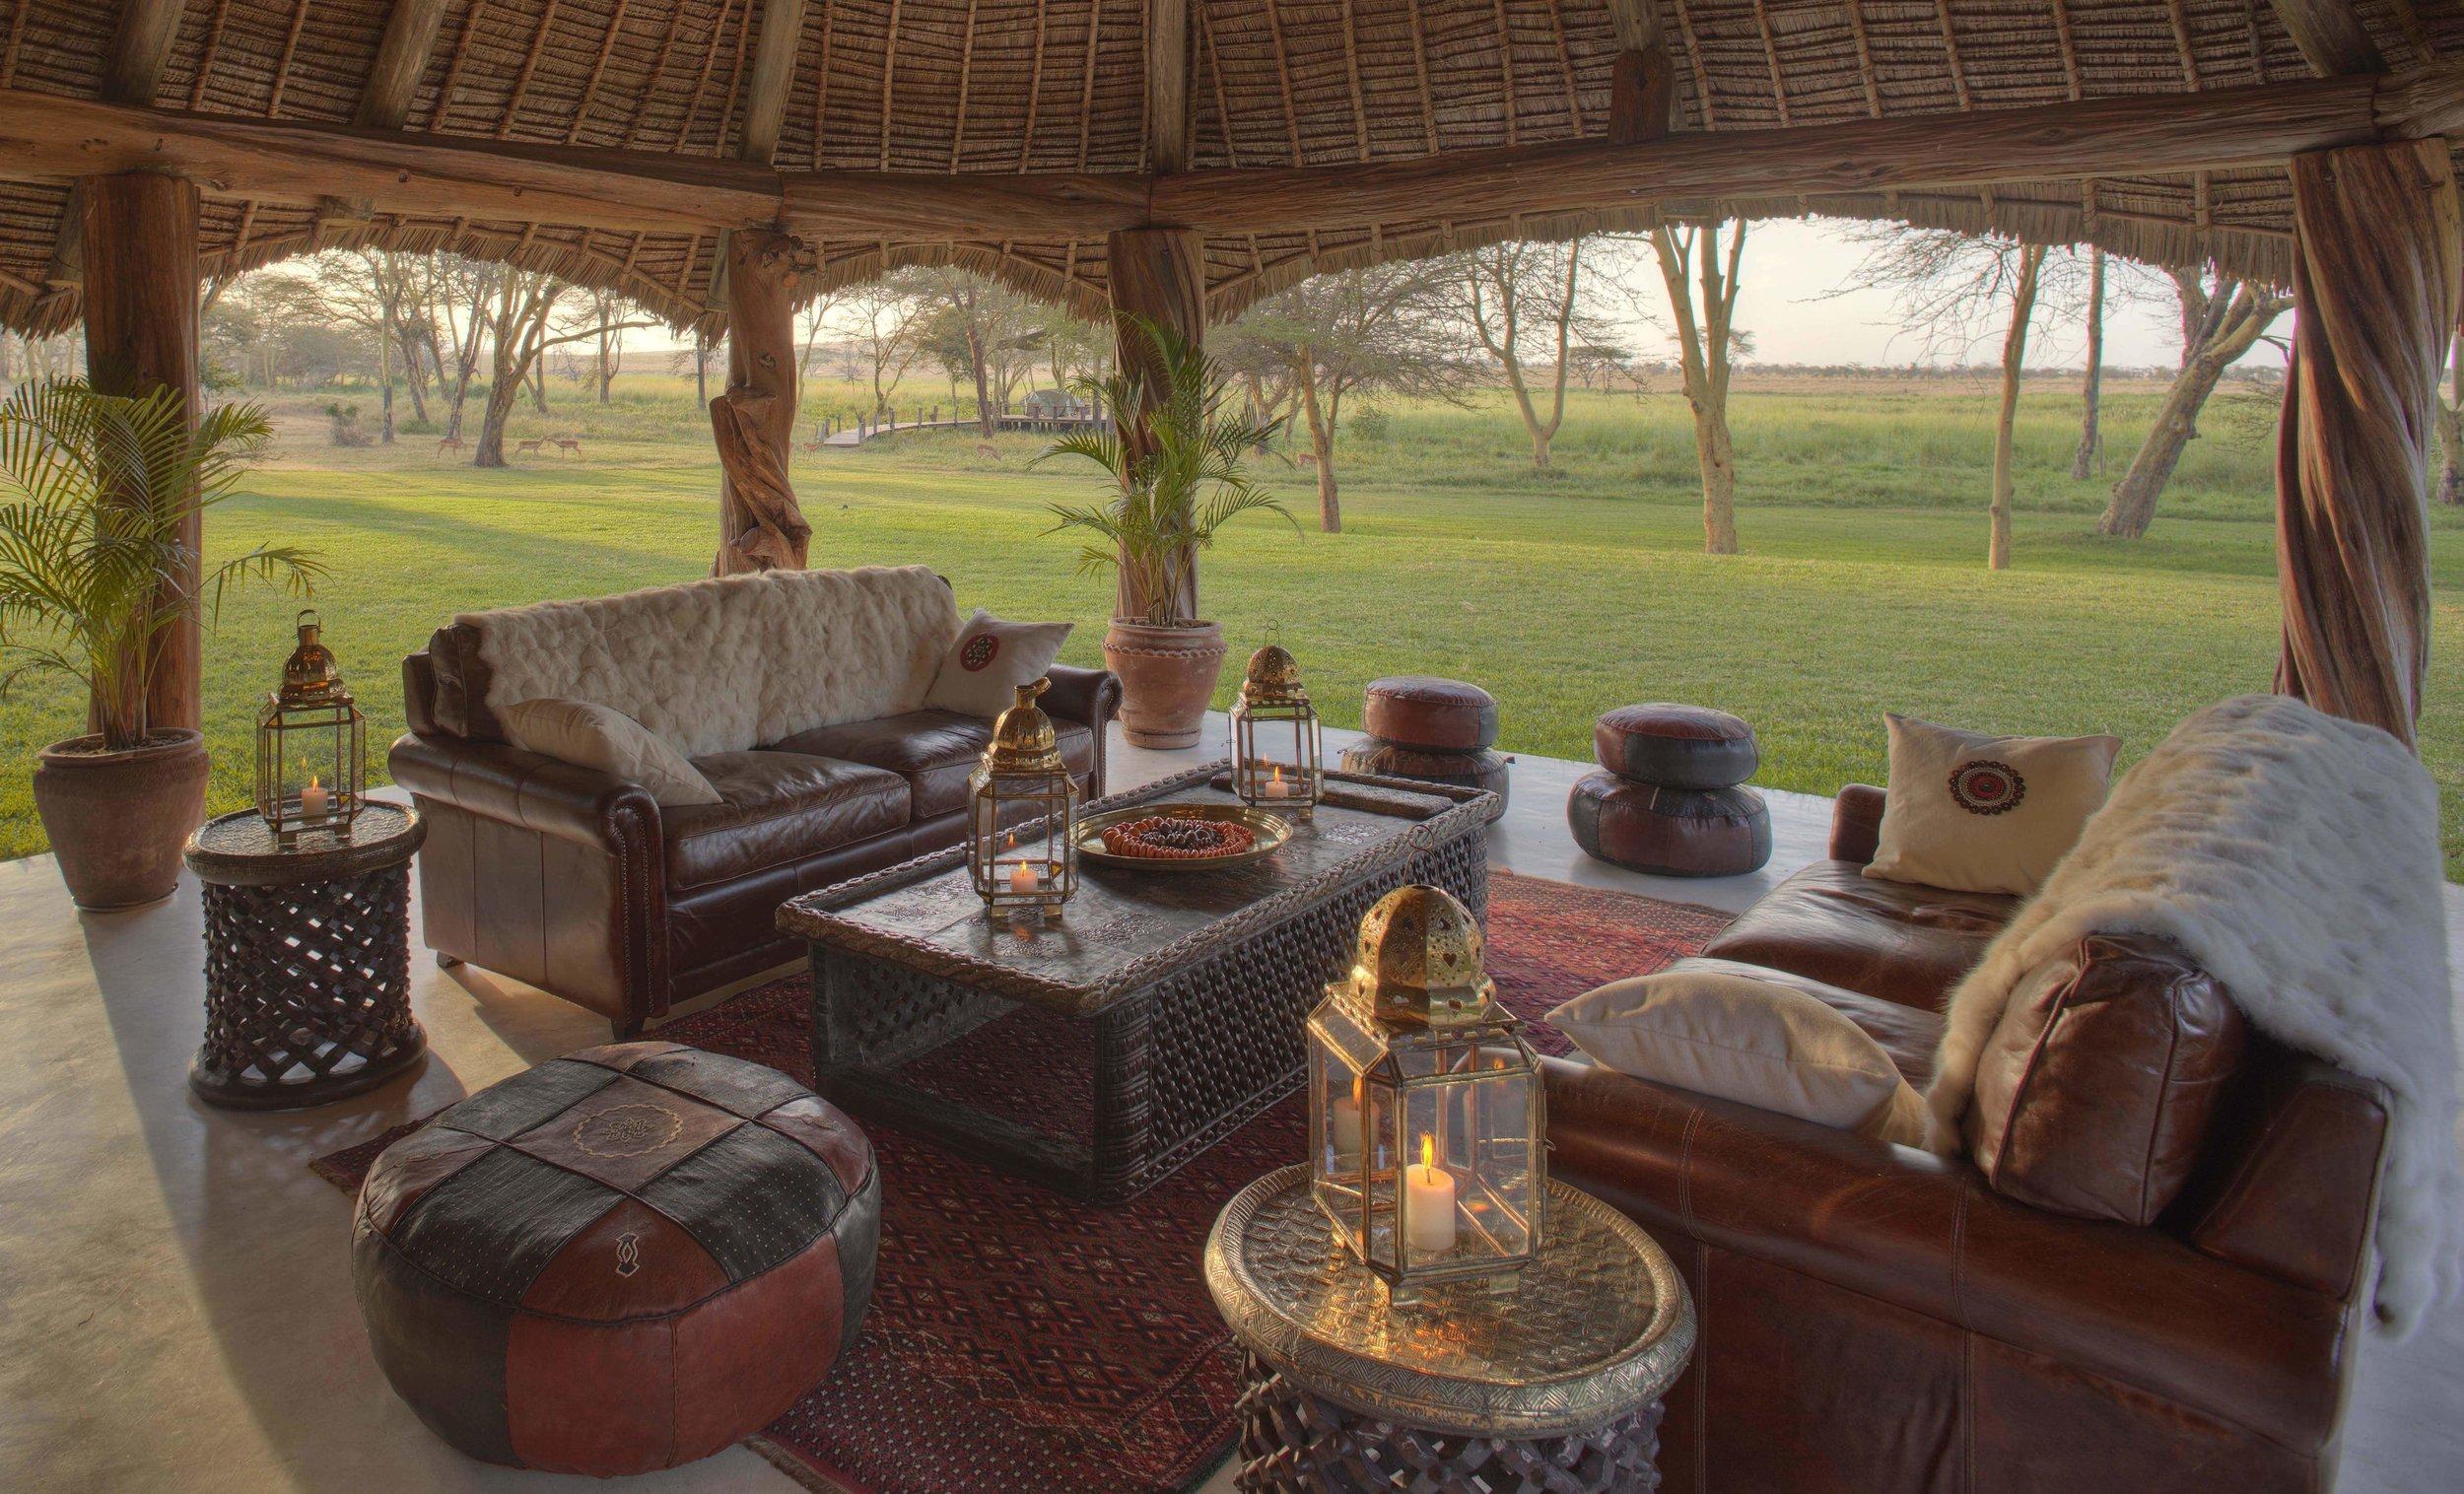 Exotic-yoga-retreats-kenya-luxury-safari.jpg